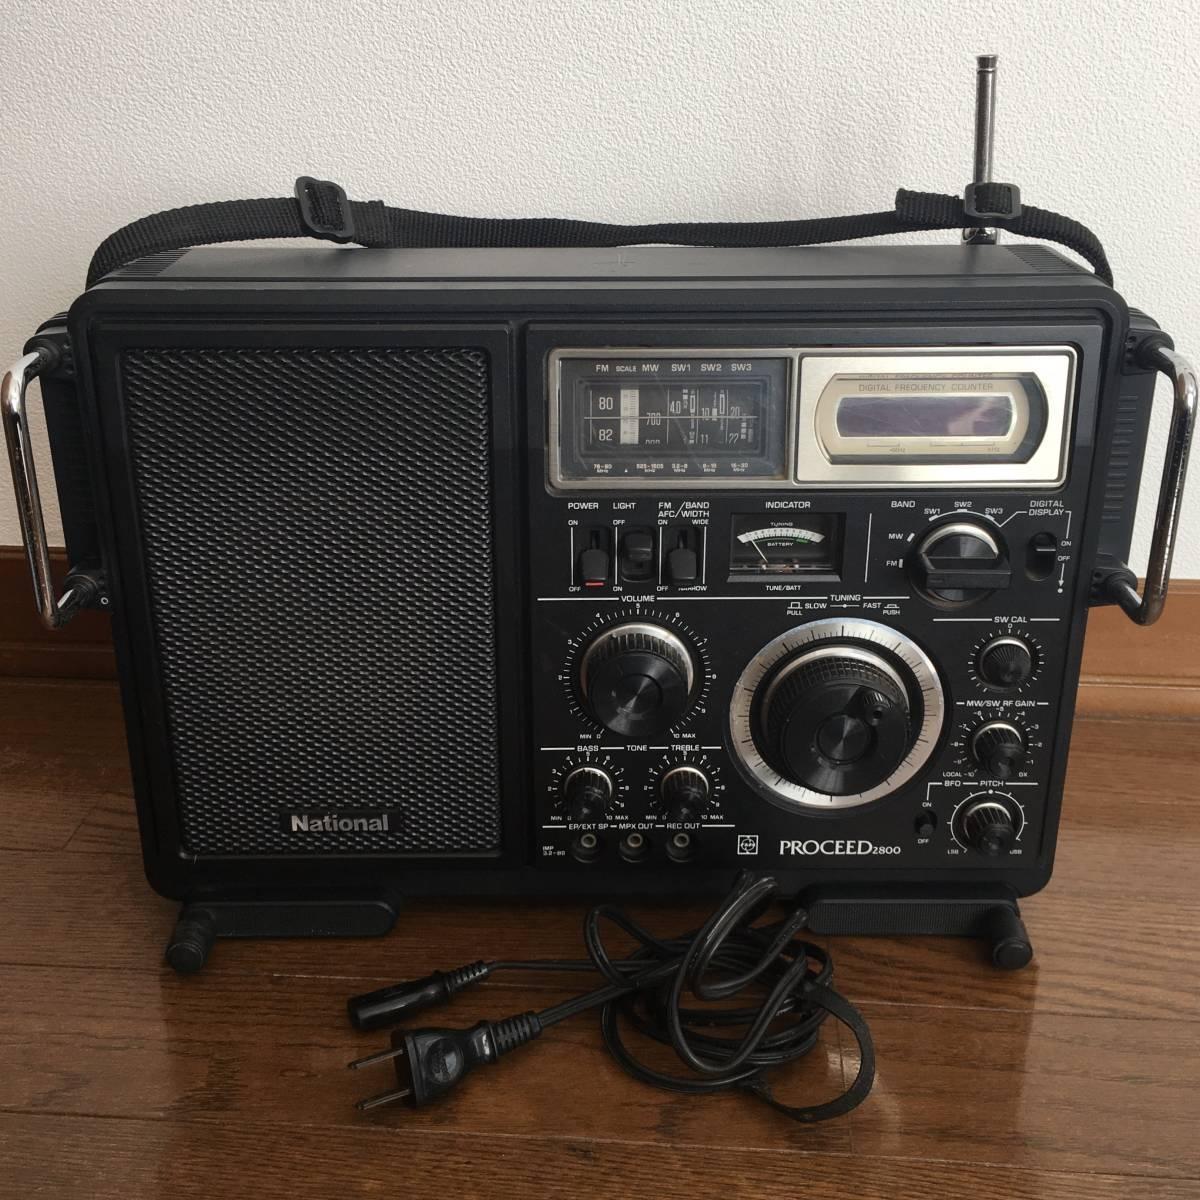 National ナショナル PROCEED2800 RF-2800 ラジオ FM受信視聴可能 現状 ジャンク扱い_画像2